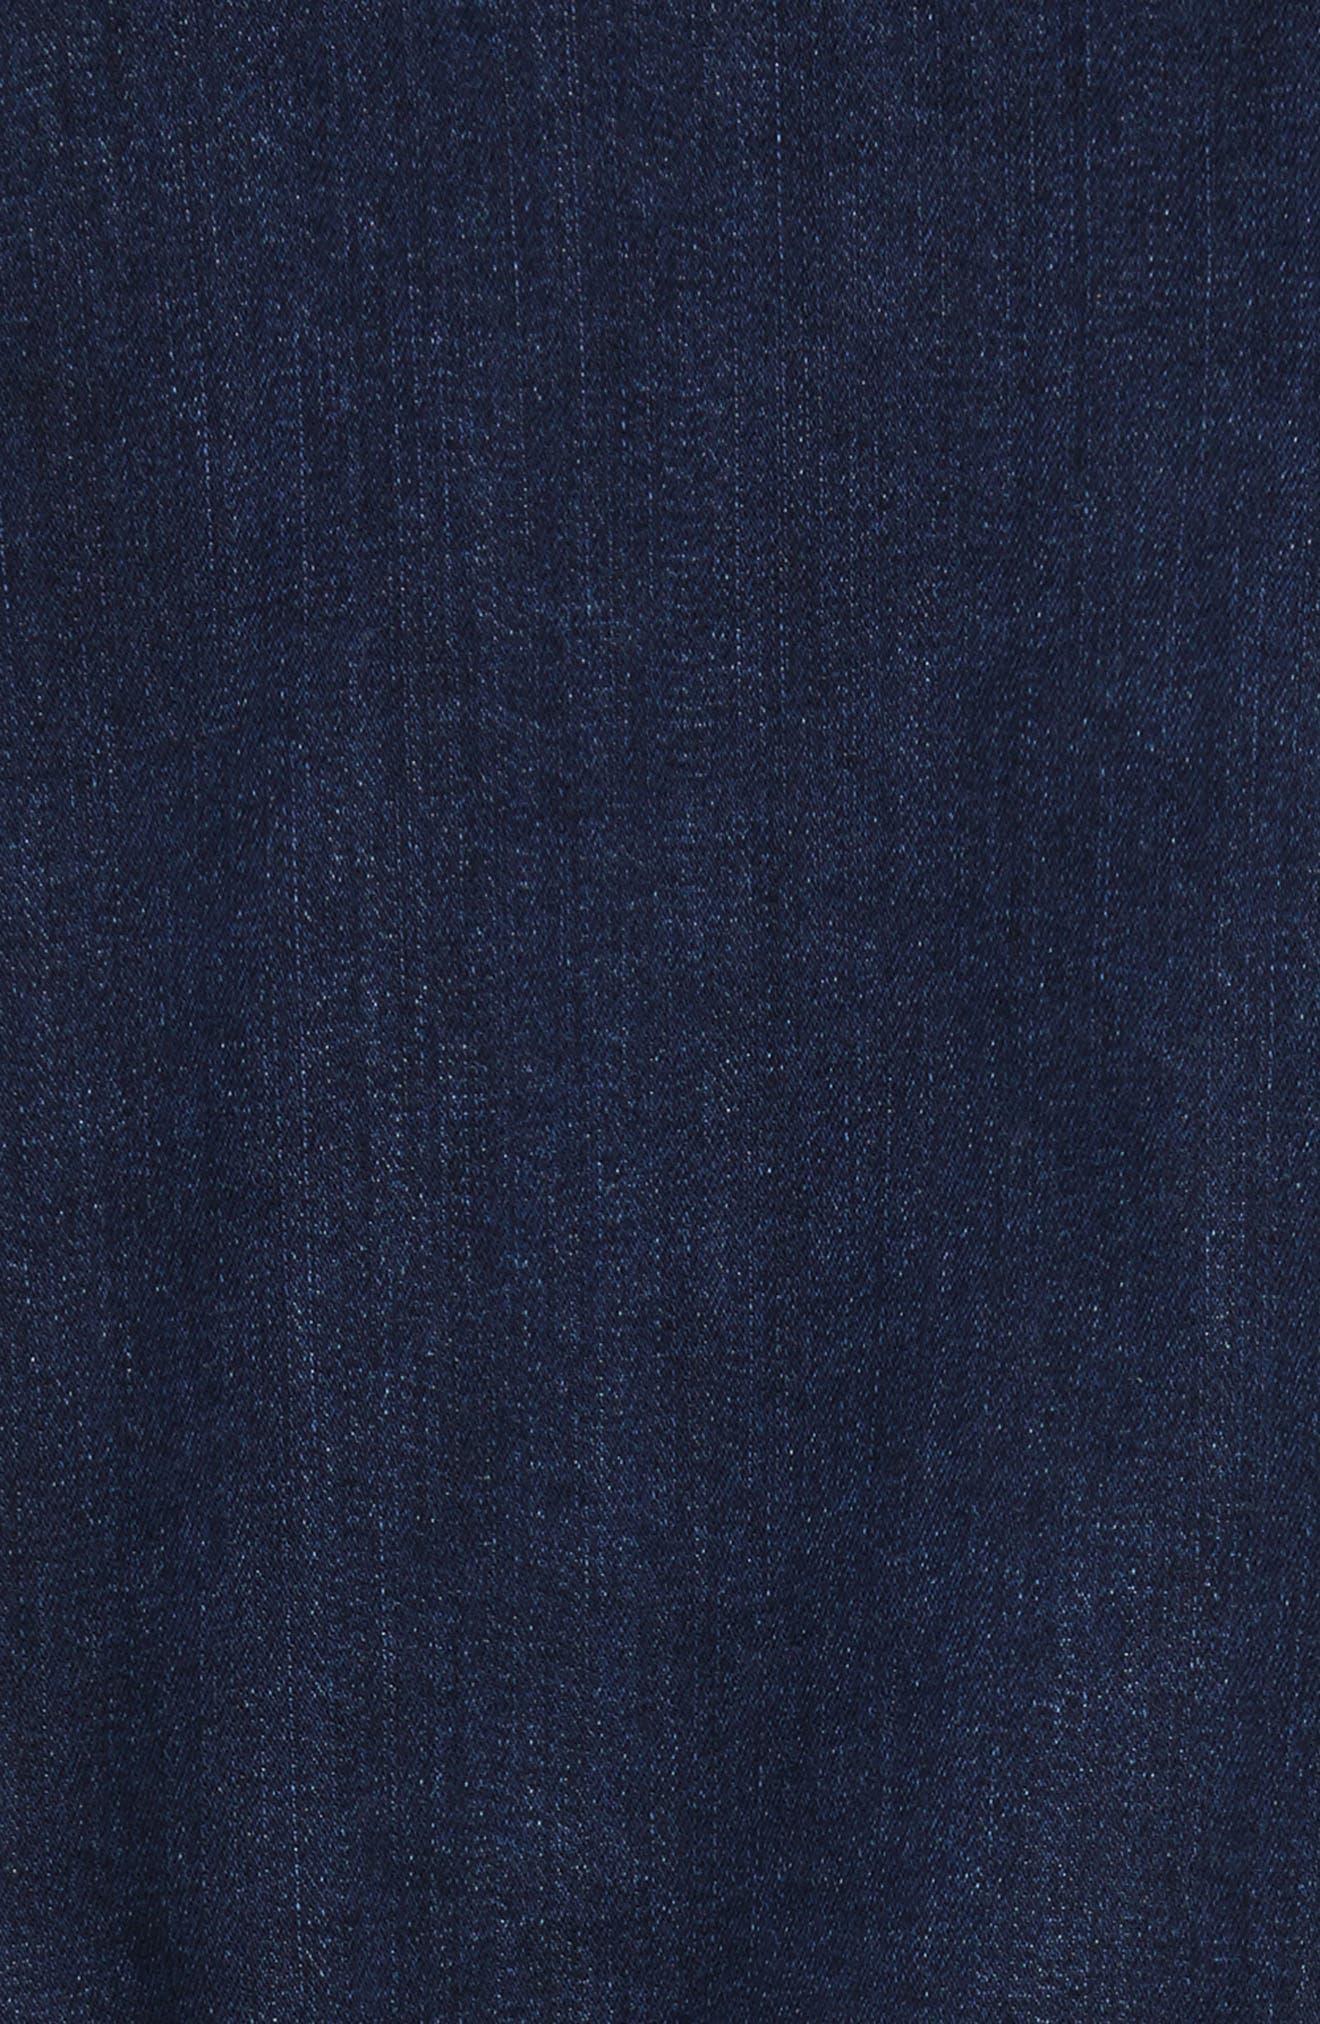 Asymmetrical Wrap Denim Skirt,                             Alternate thumbnail 4, color,                             Sea Blue Wash